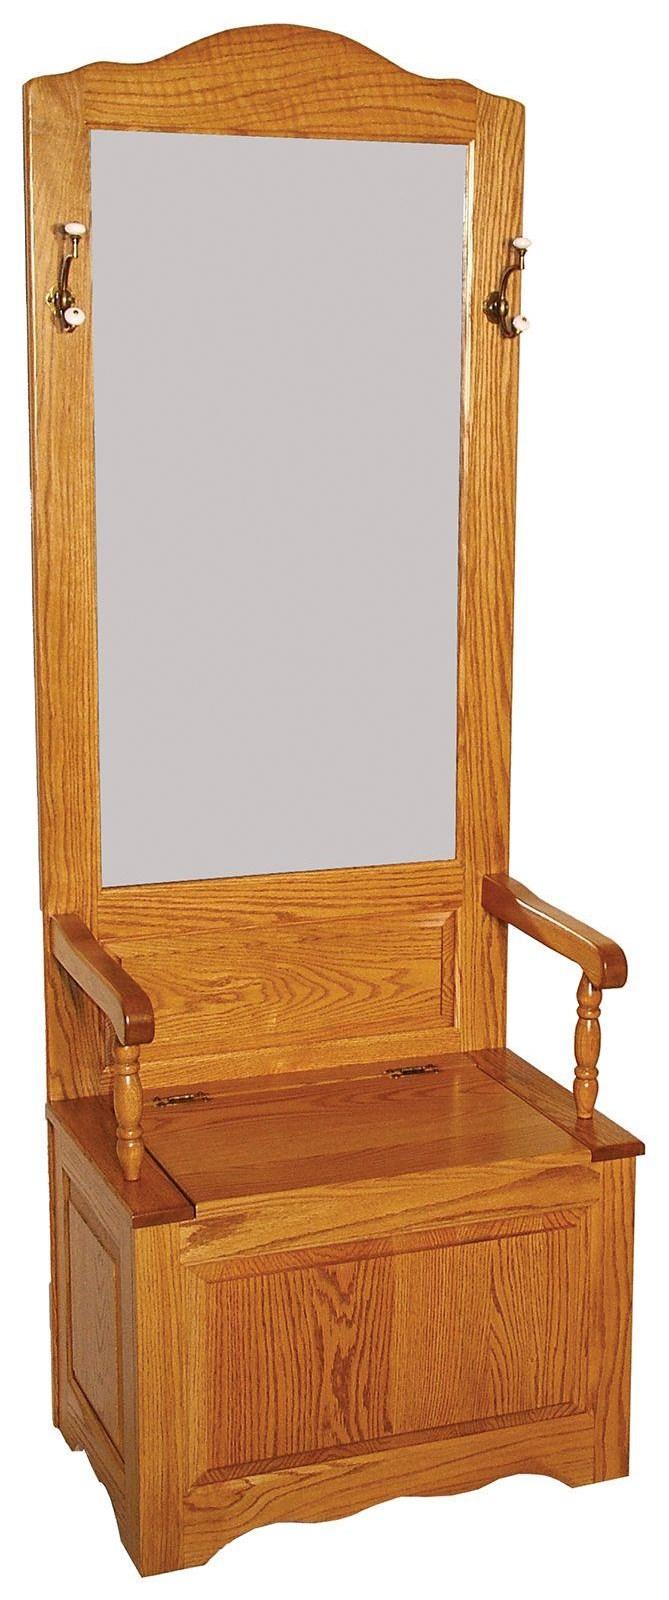 Regular Hall Seat